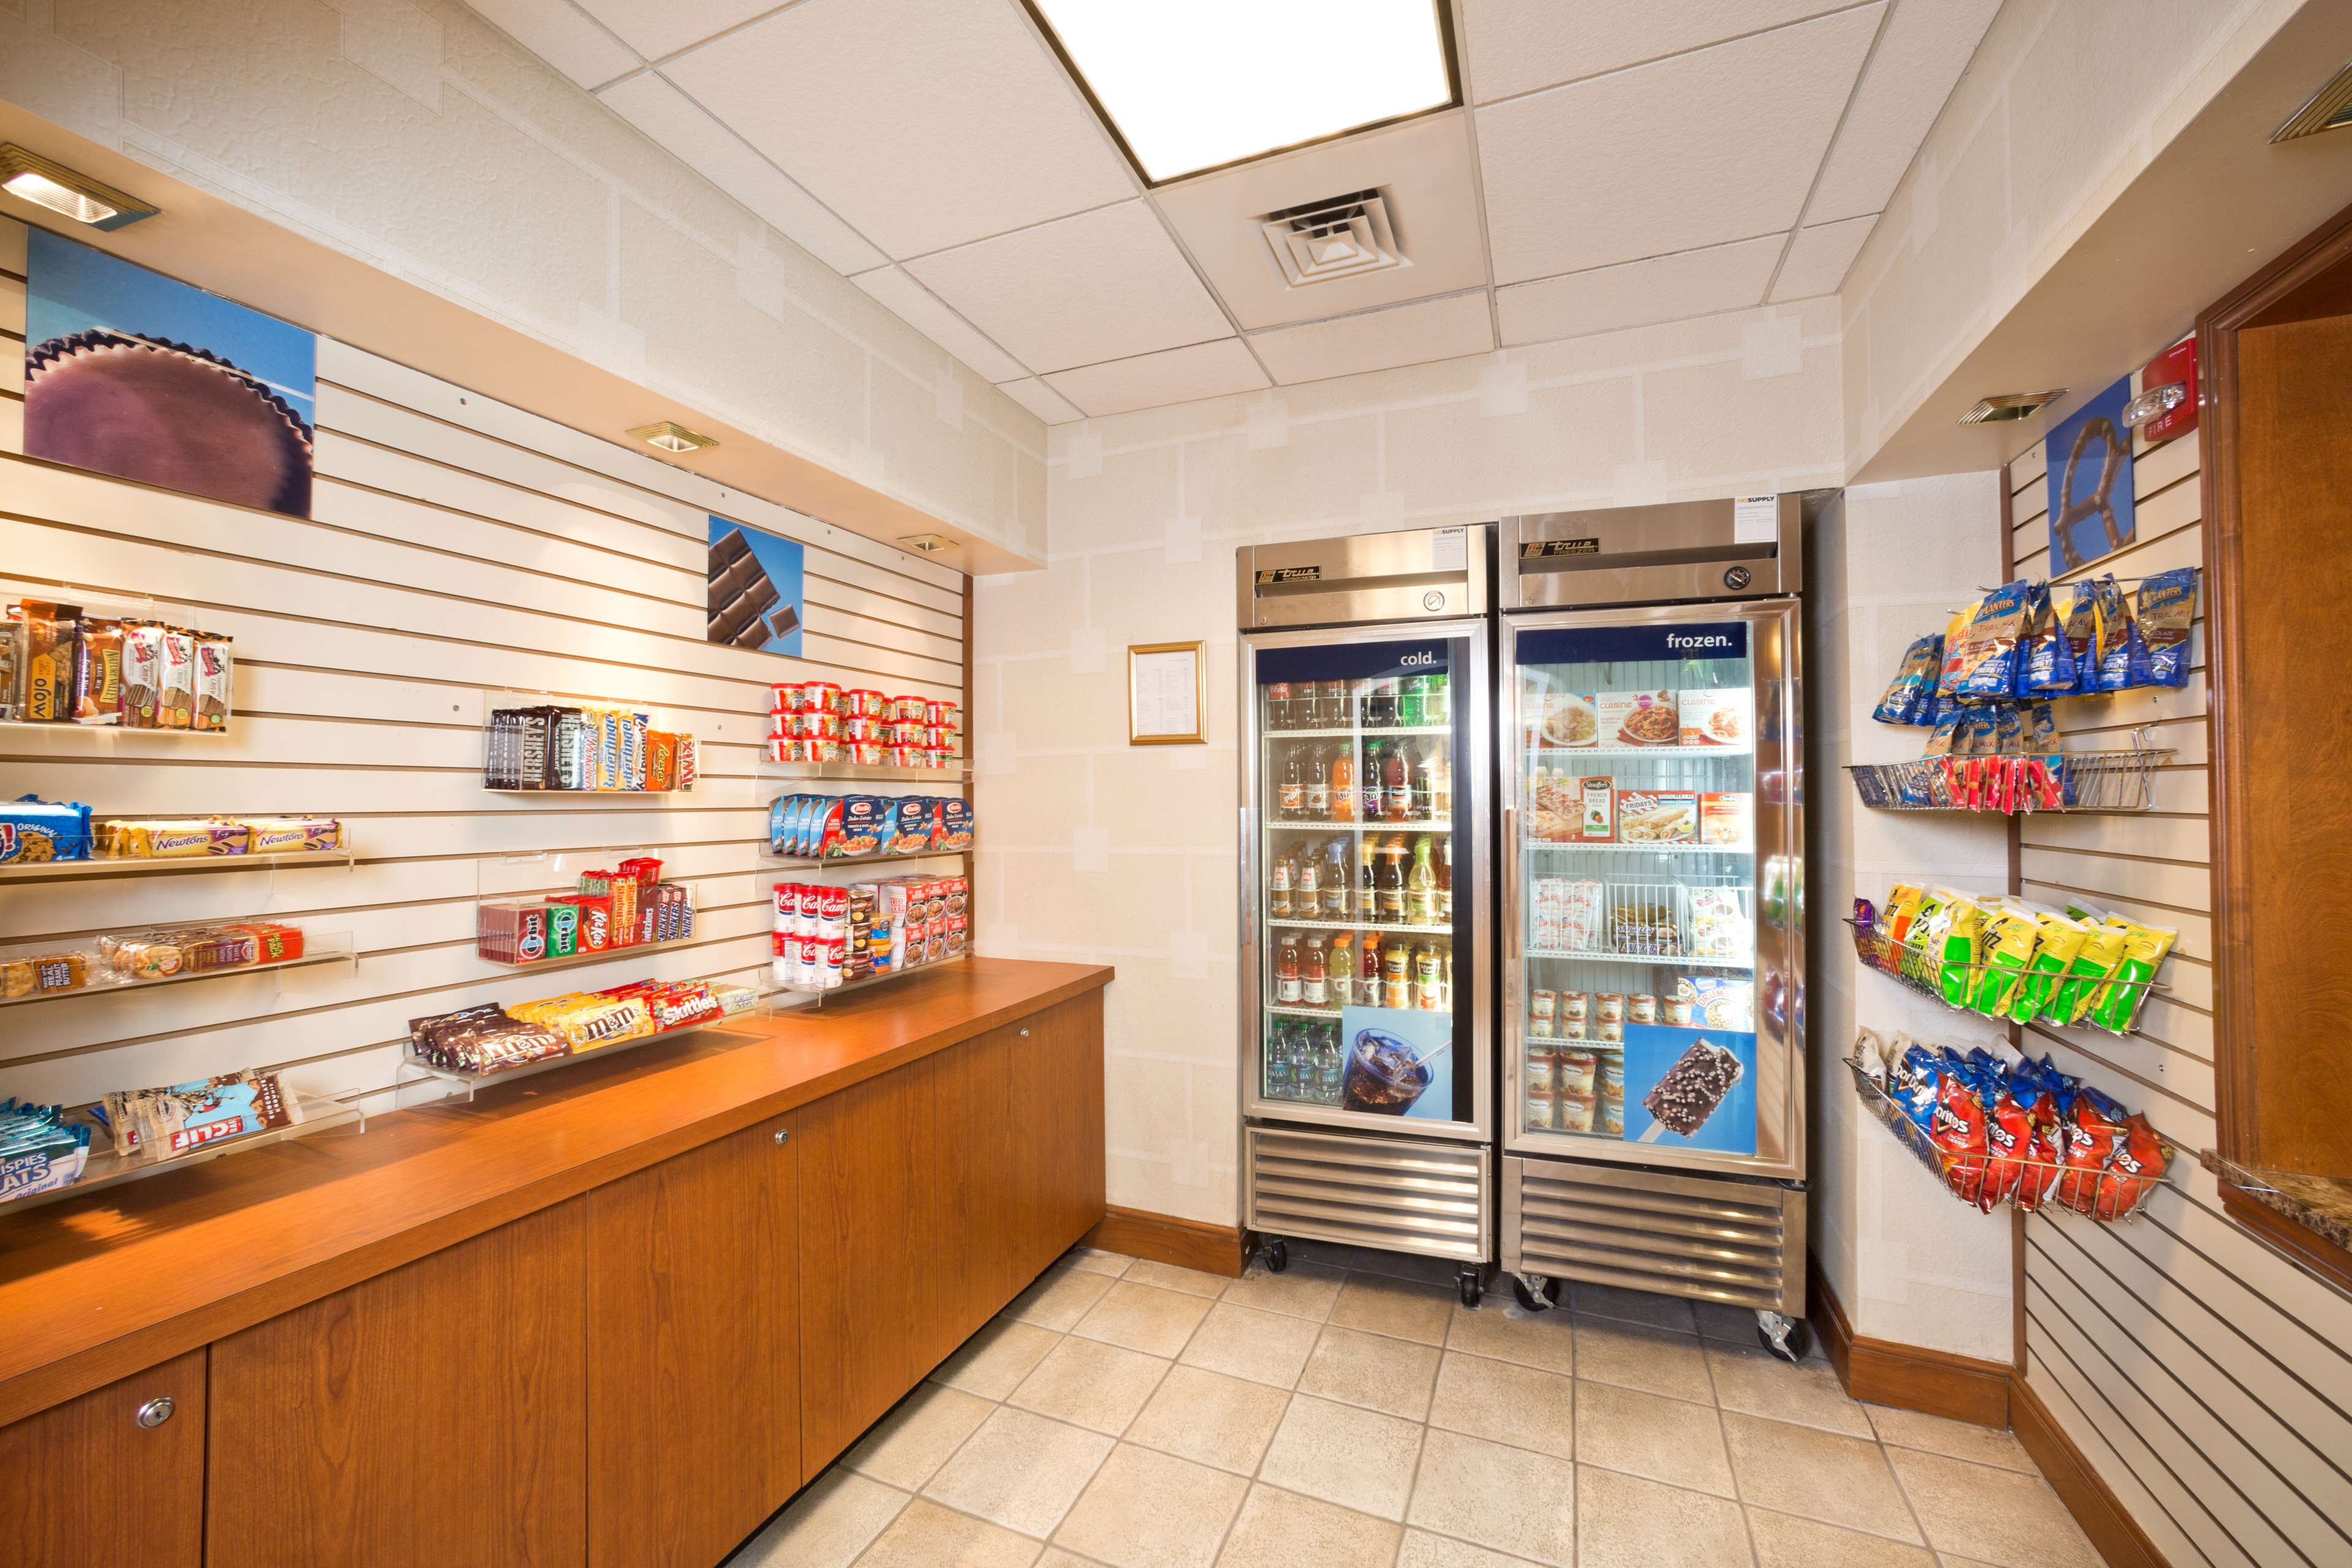 Hampton Inn & Suites Arundel Mills/Baltimore image 6